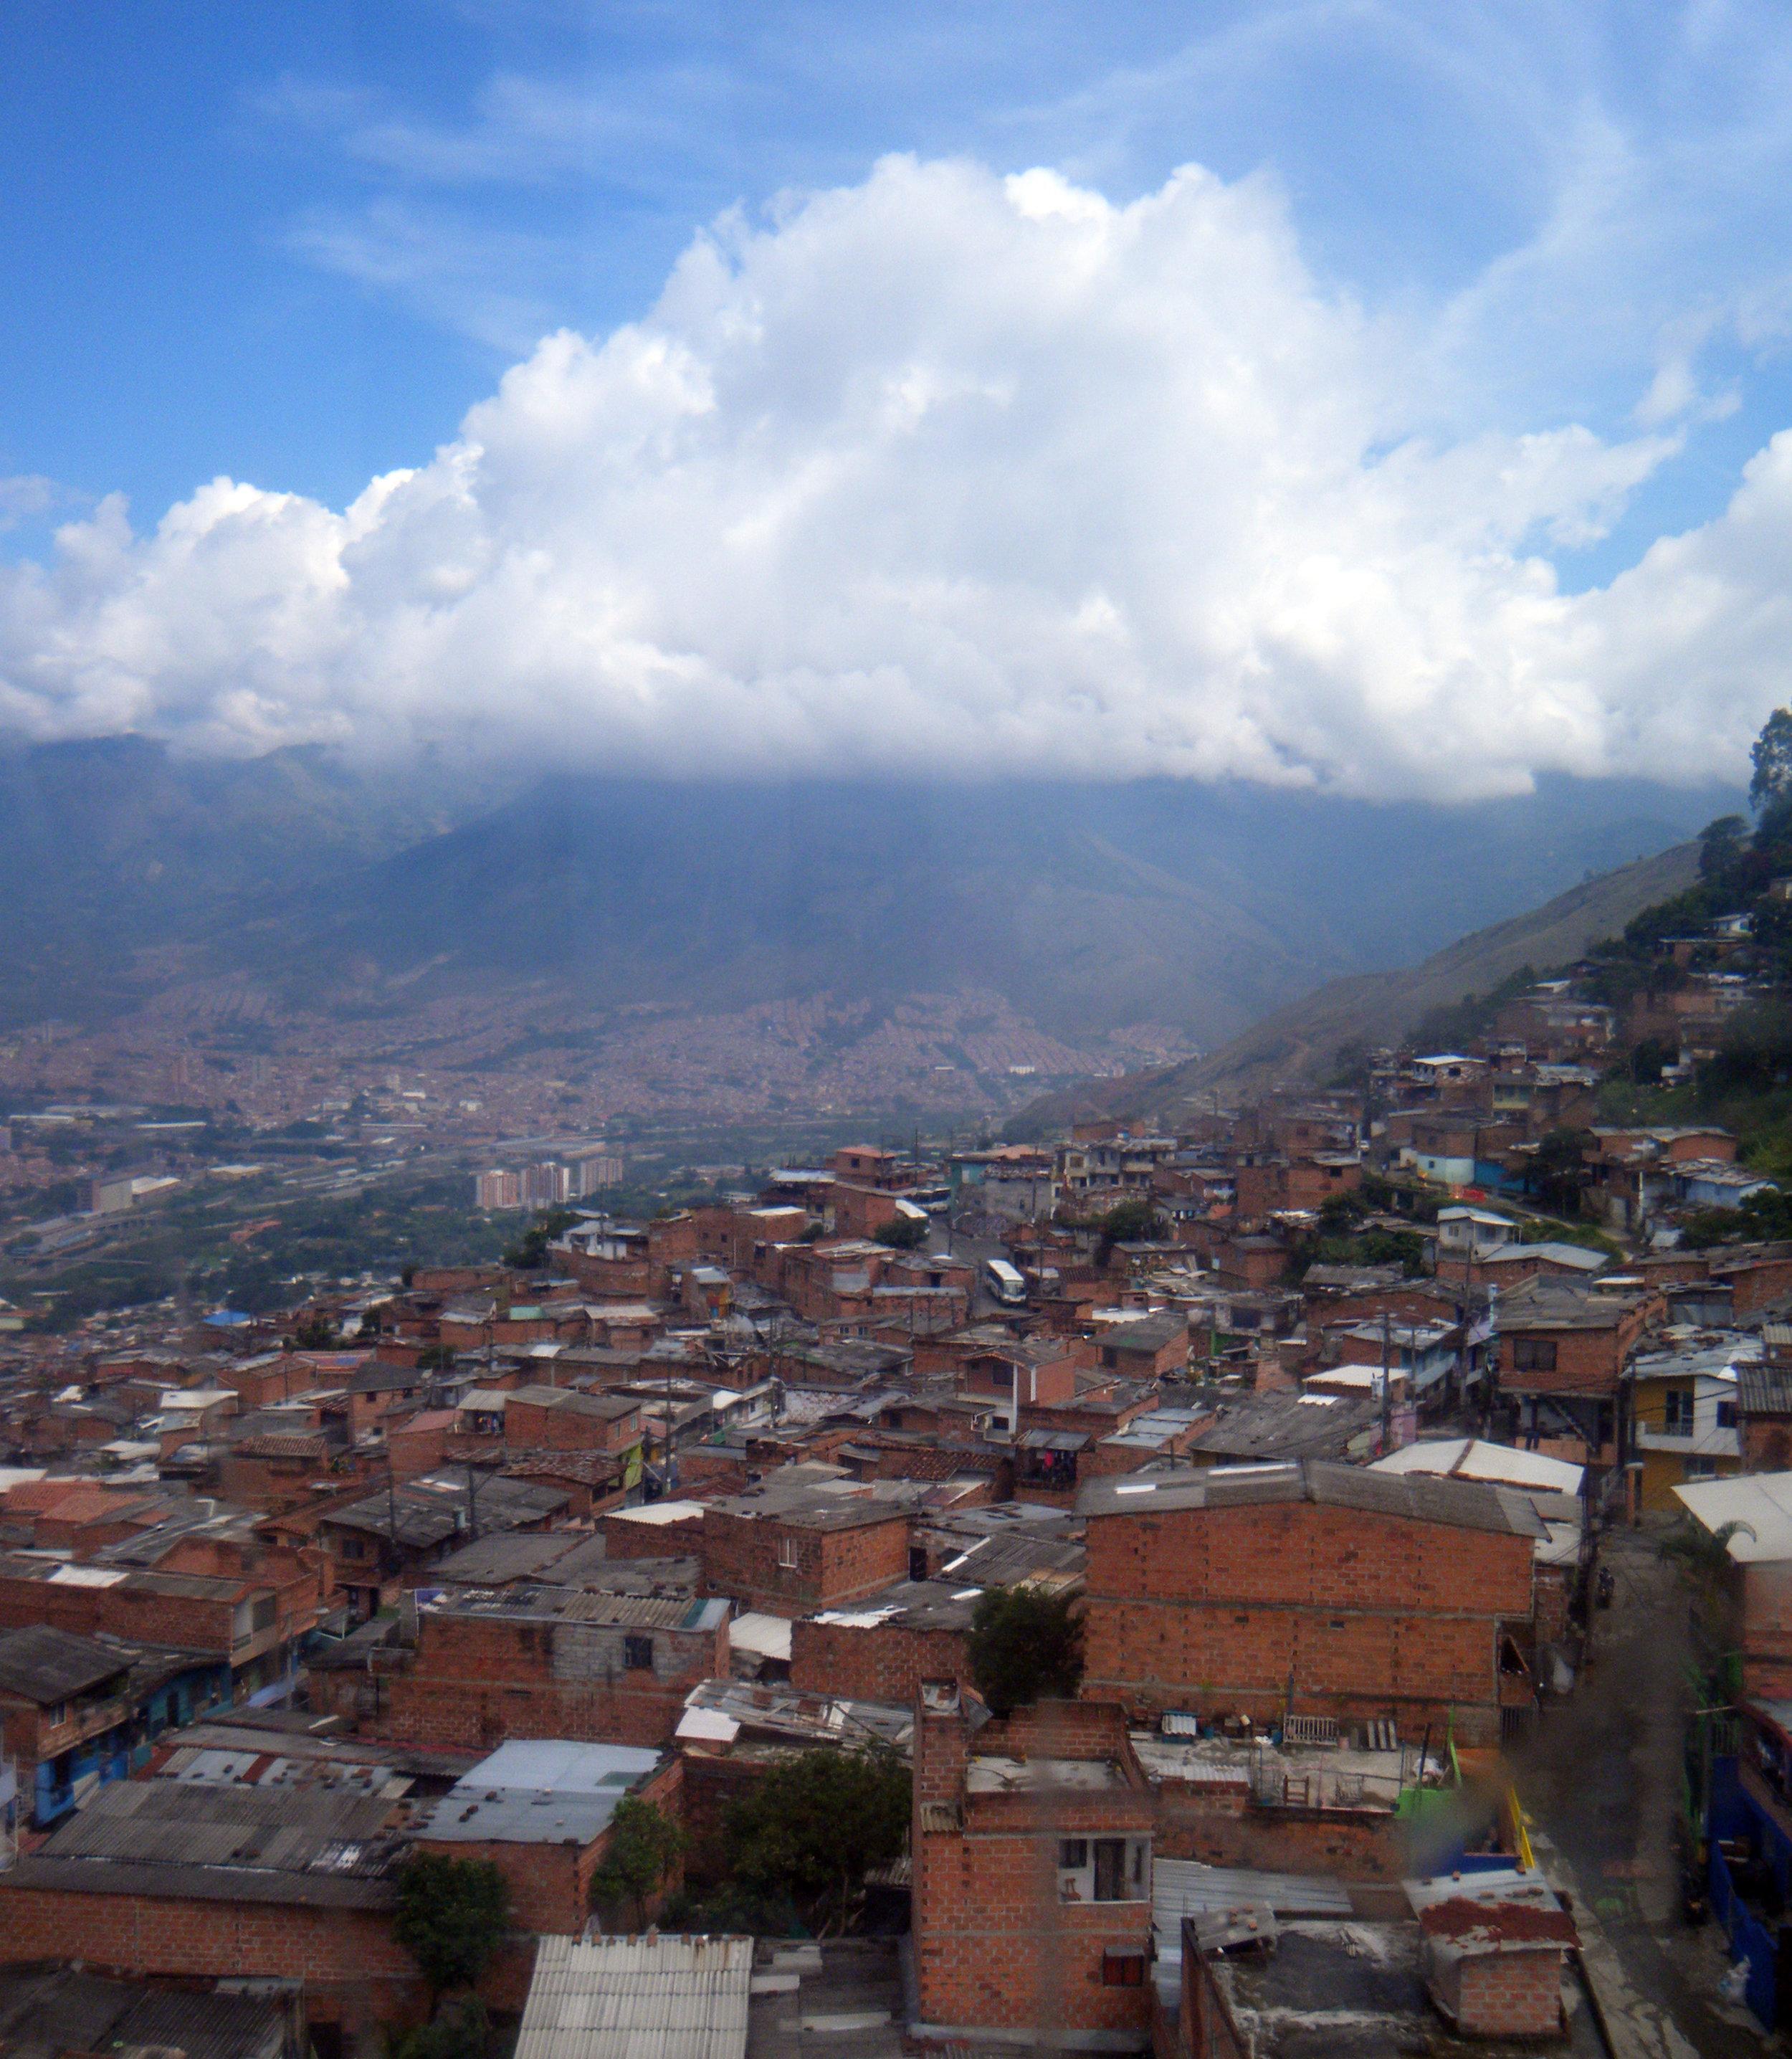 Medellin 10-20-12.jpg